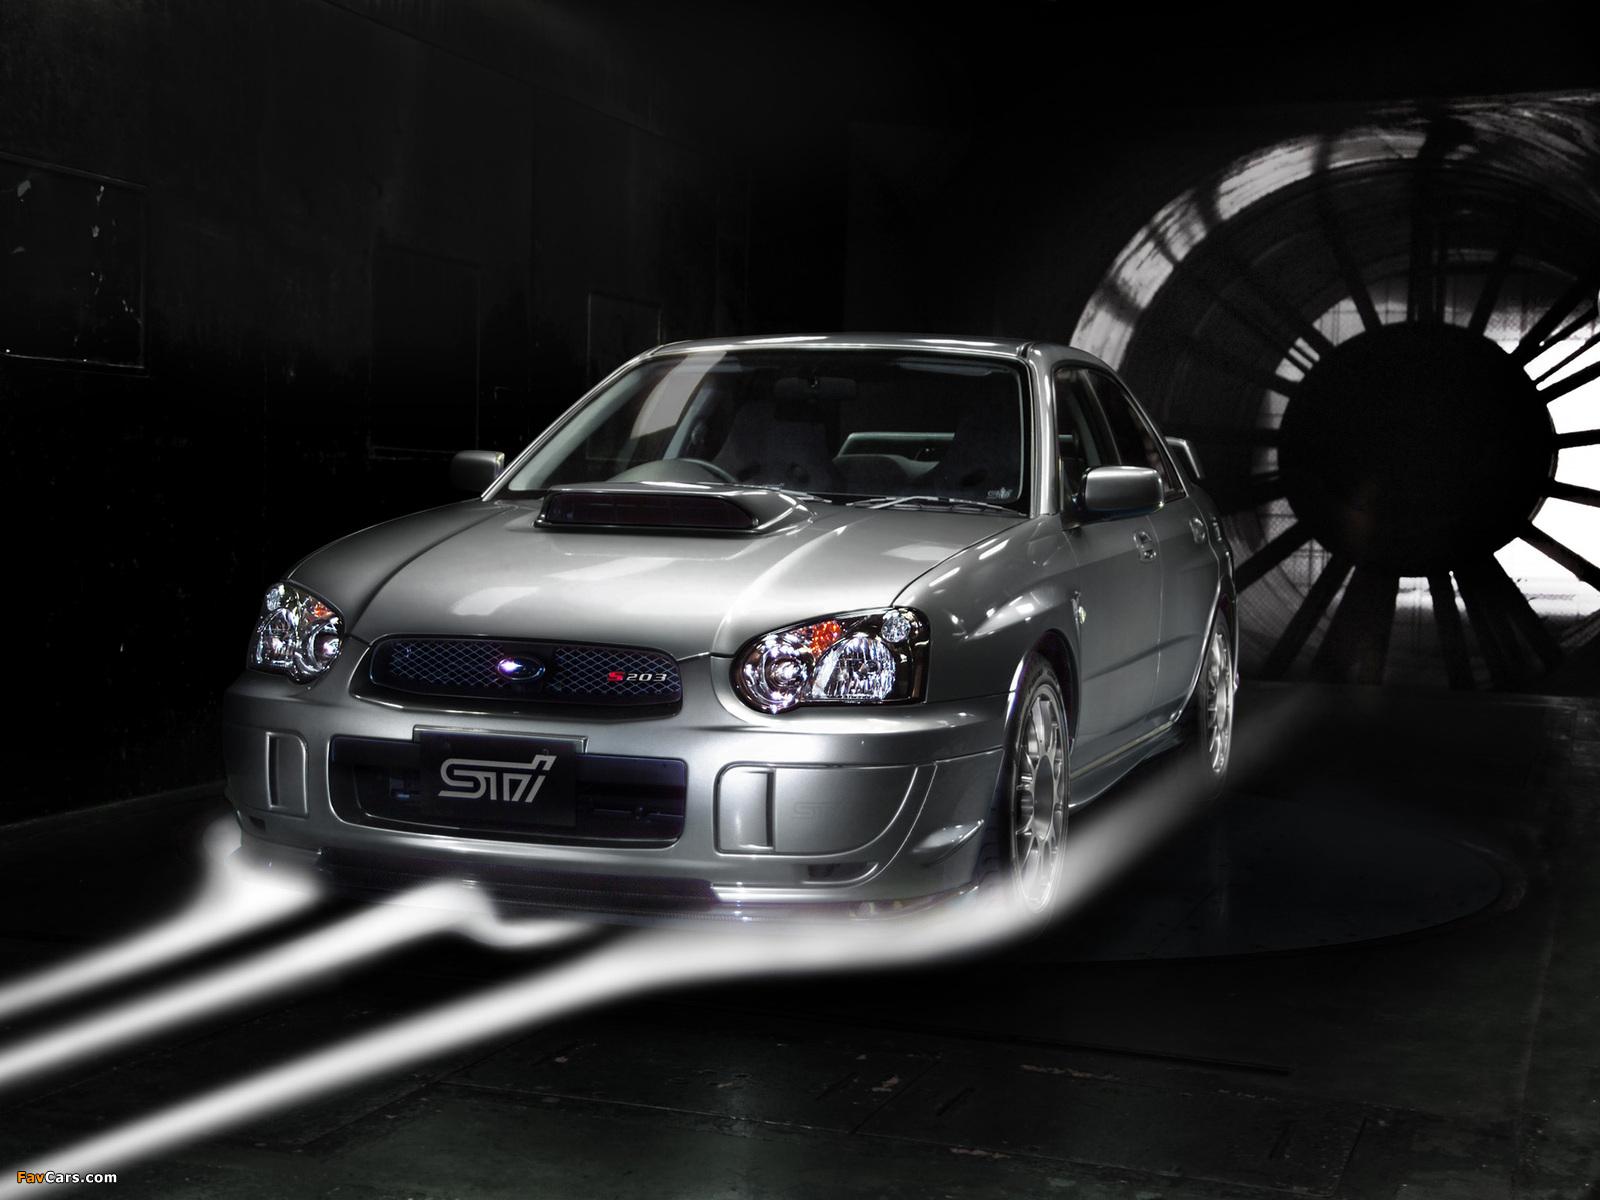 Subaru Impreza Sti S203 Gdb 2005 Wallpapers 1600x1200